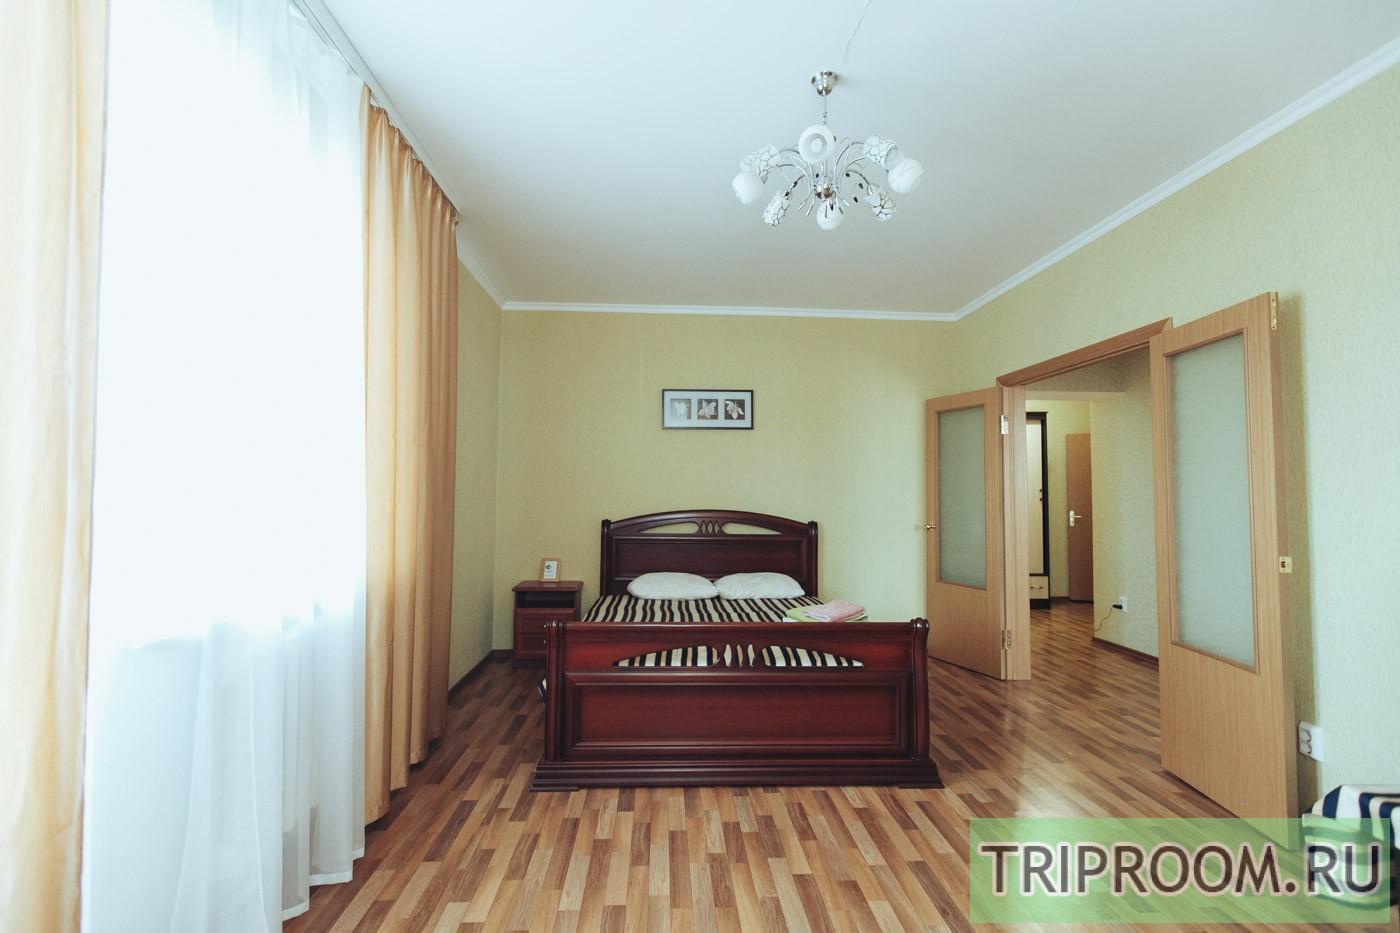 1-комнатная квартира посуточно (вариант № 30979), ул. Петра Смородина улица, фото № 2